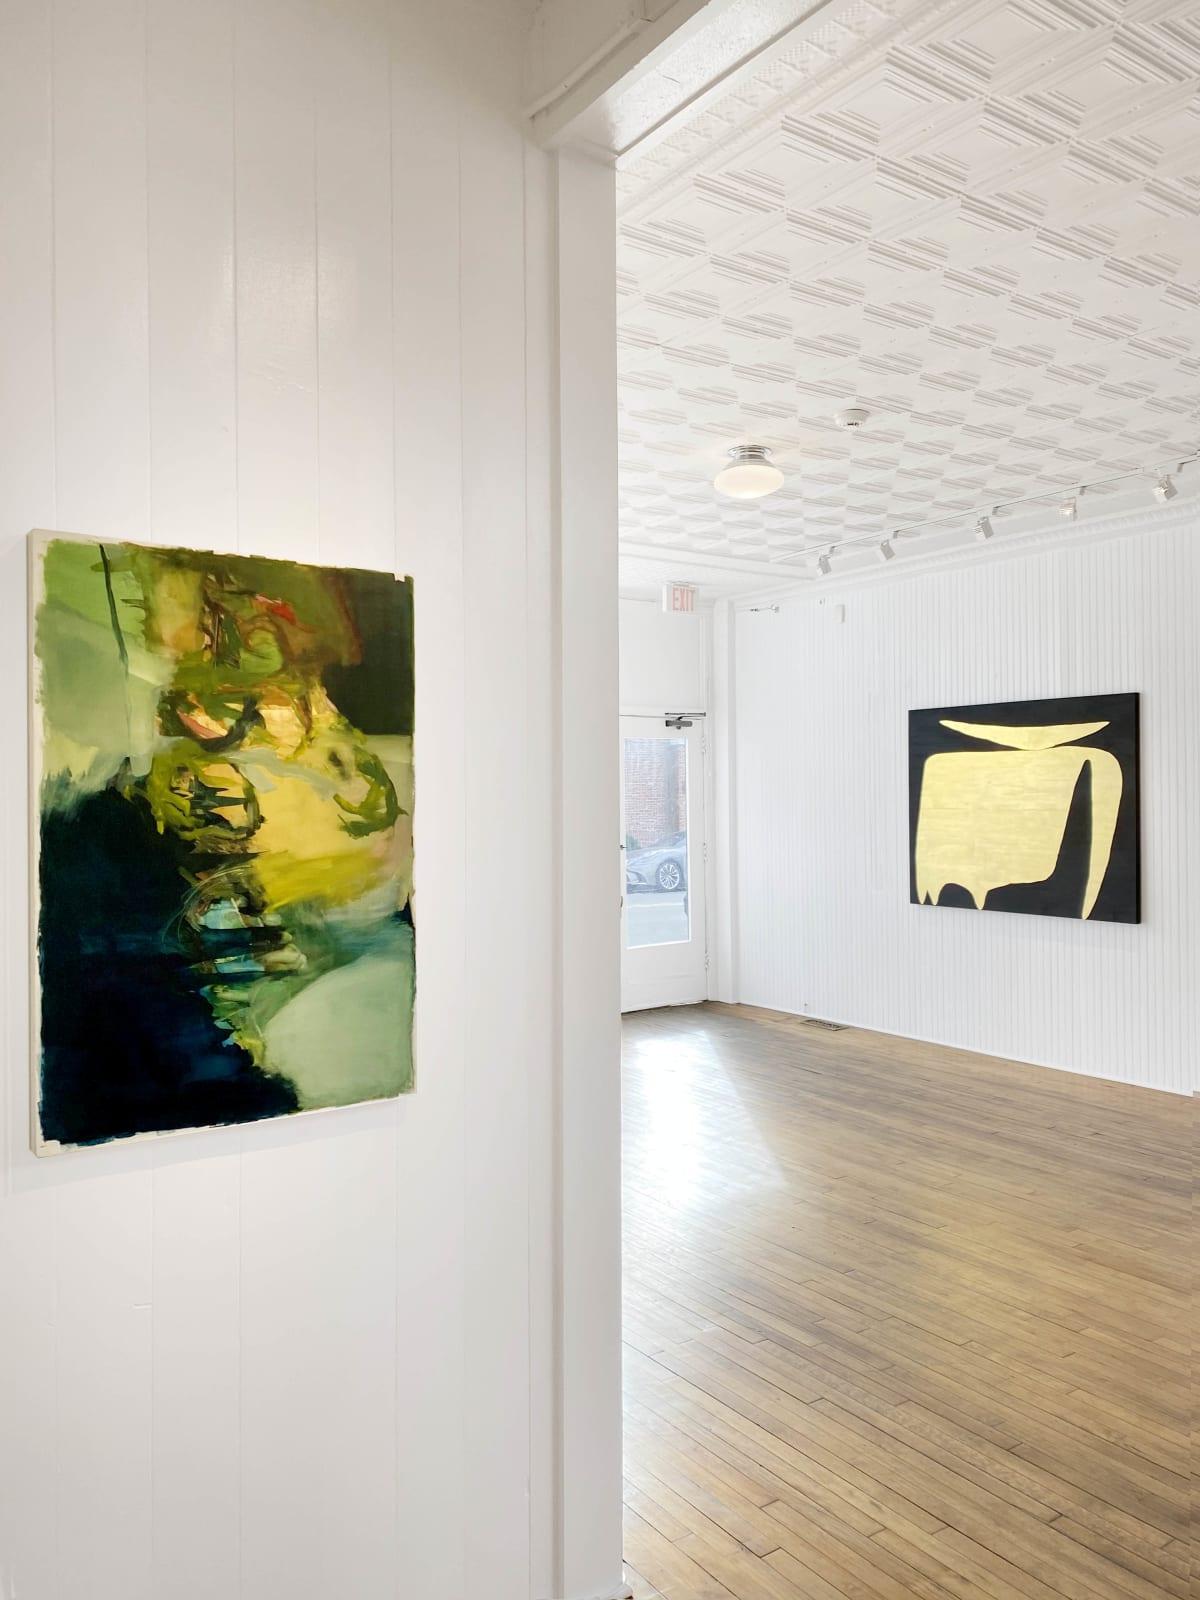 Installation view: A Way of Feeling: Thomas Agrinier, Hollis Heichemer, and Anna Pietrzak